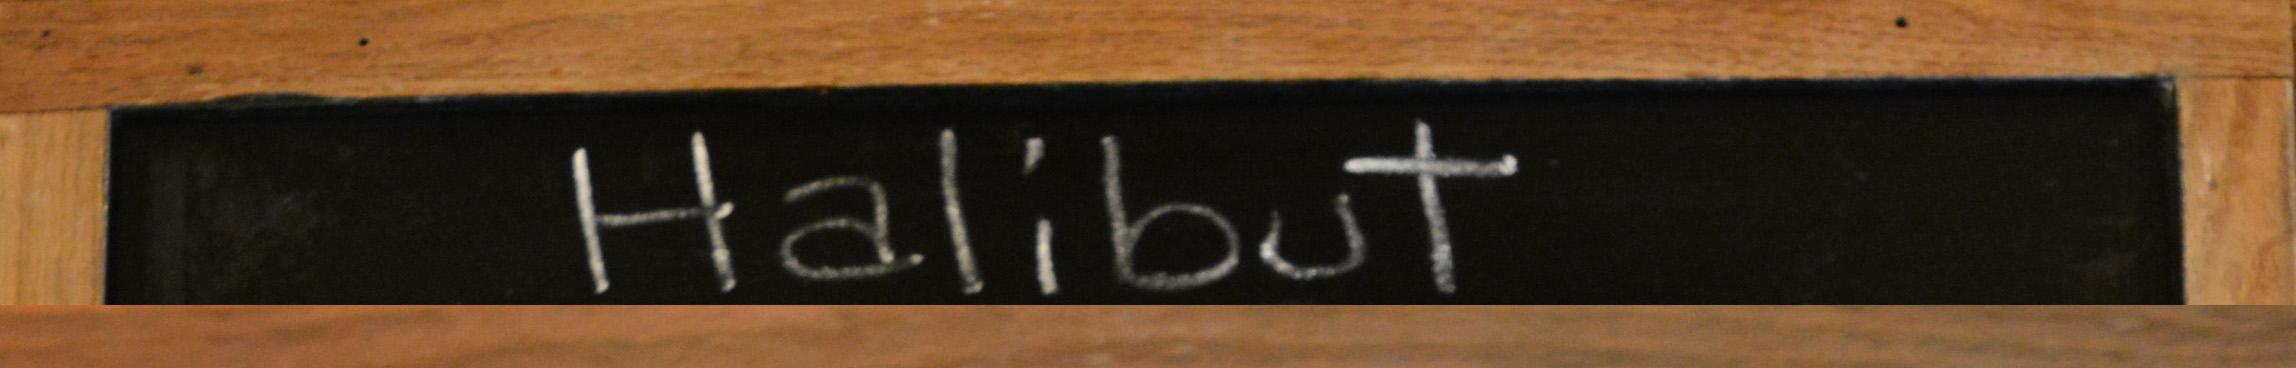 halibut title.JPG